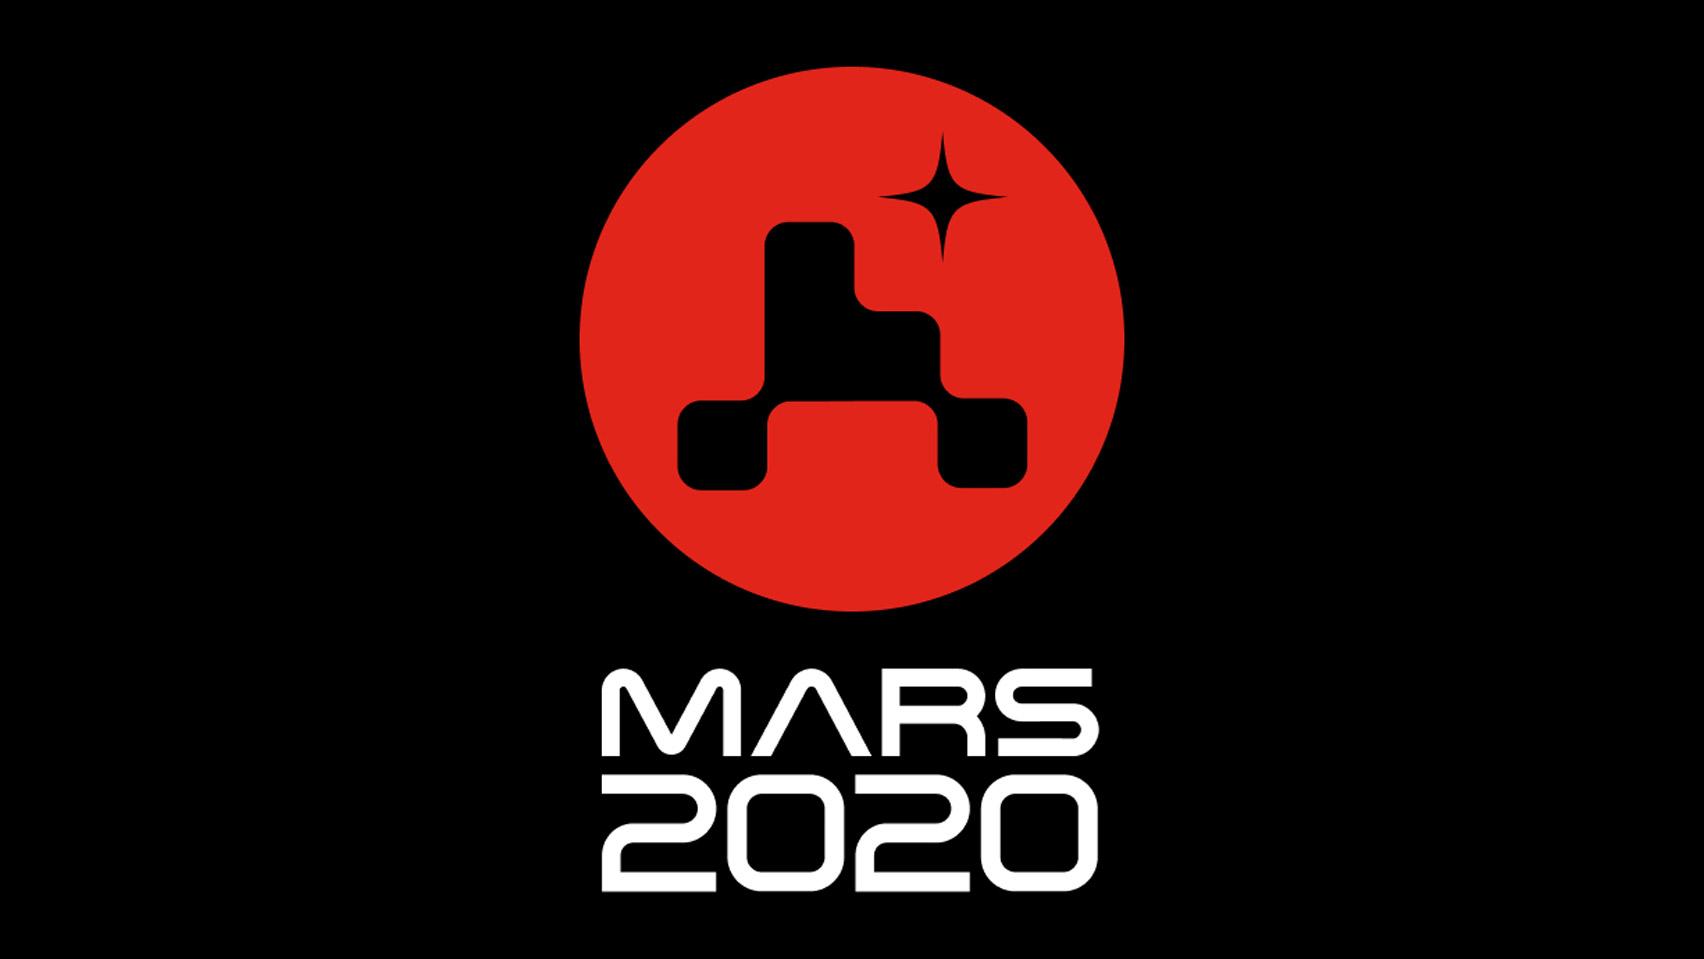 nasa mars 2020 missao logo design designe